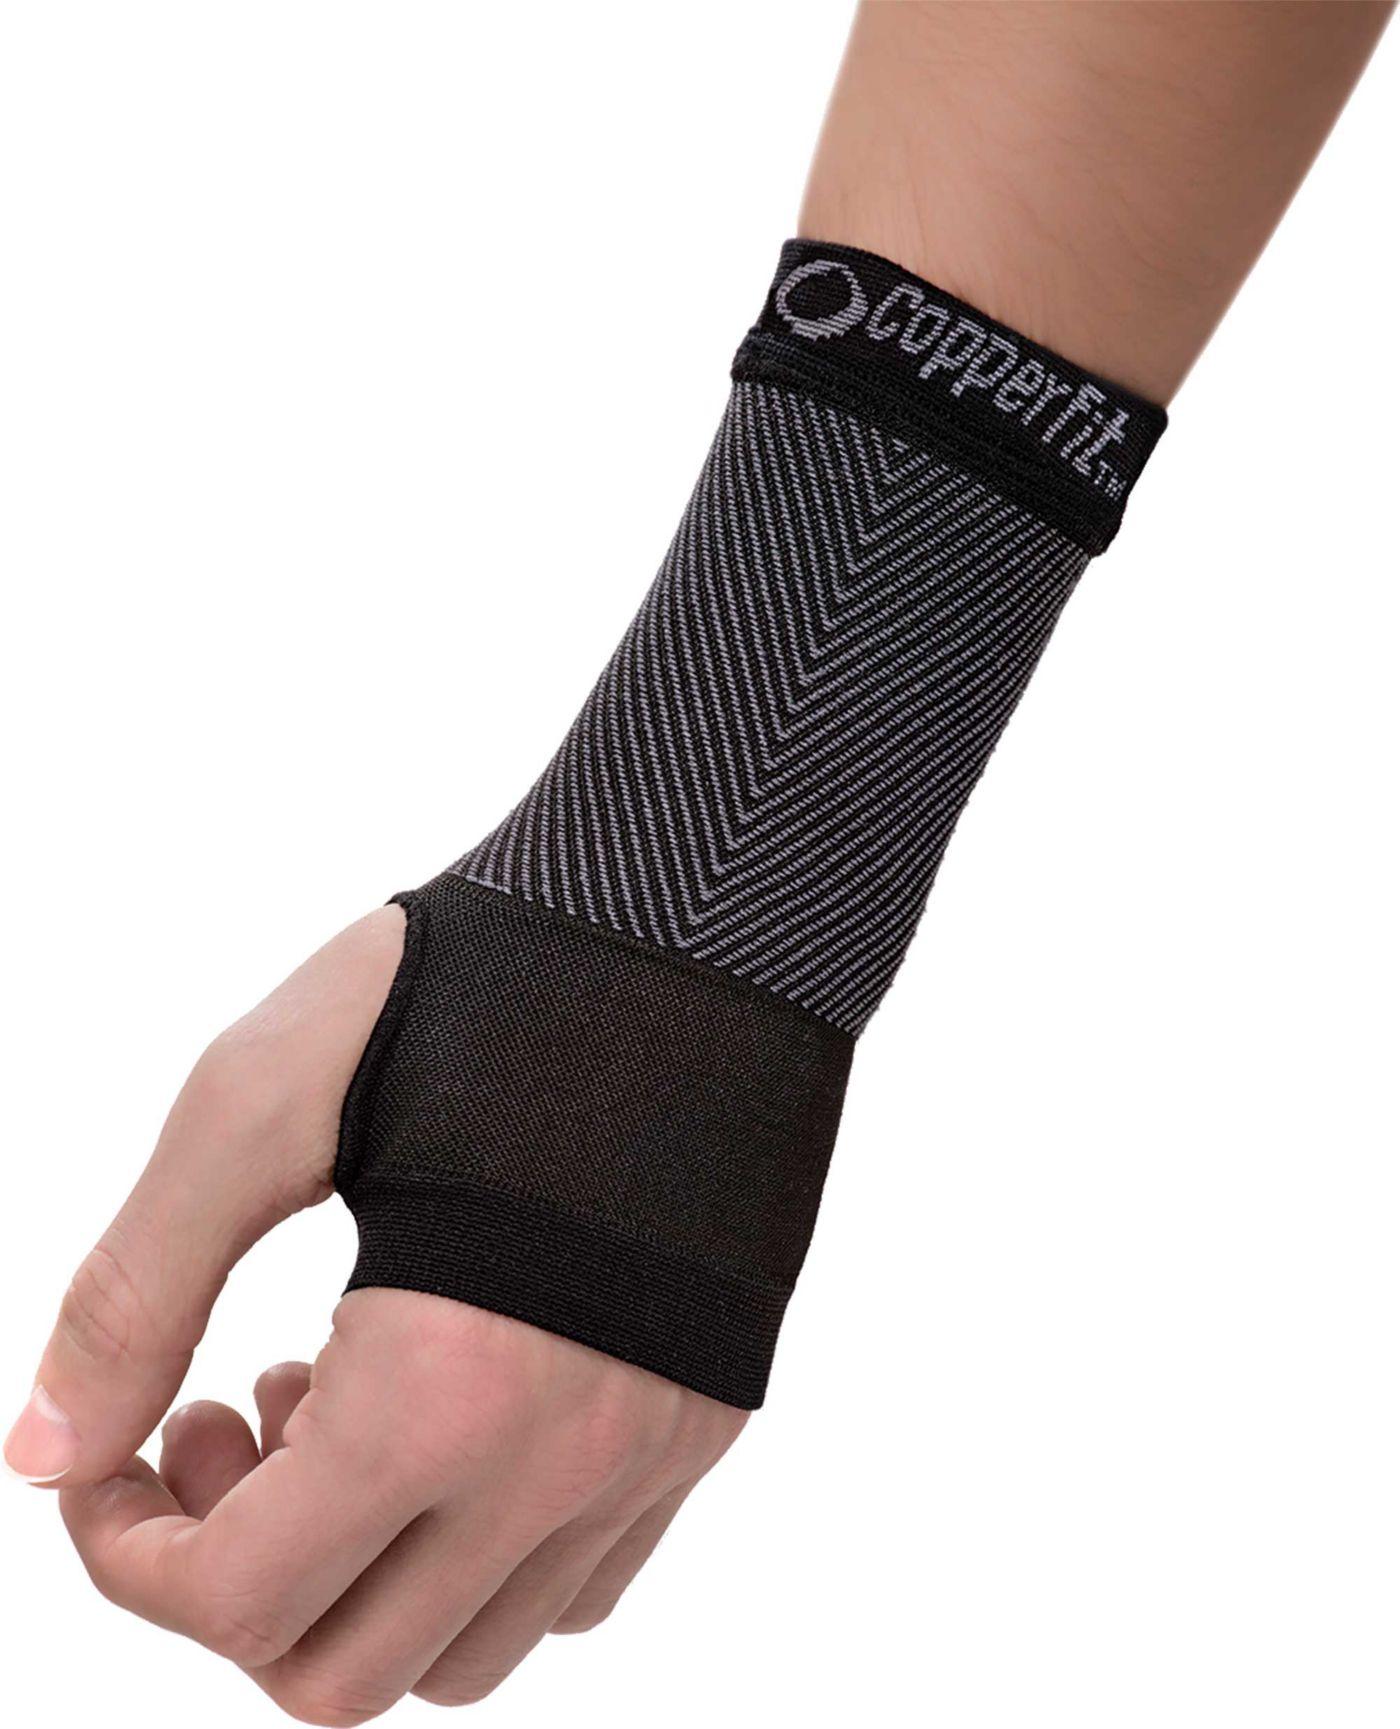 Copper Fit Advanced Compression Wrist Sleeve